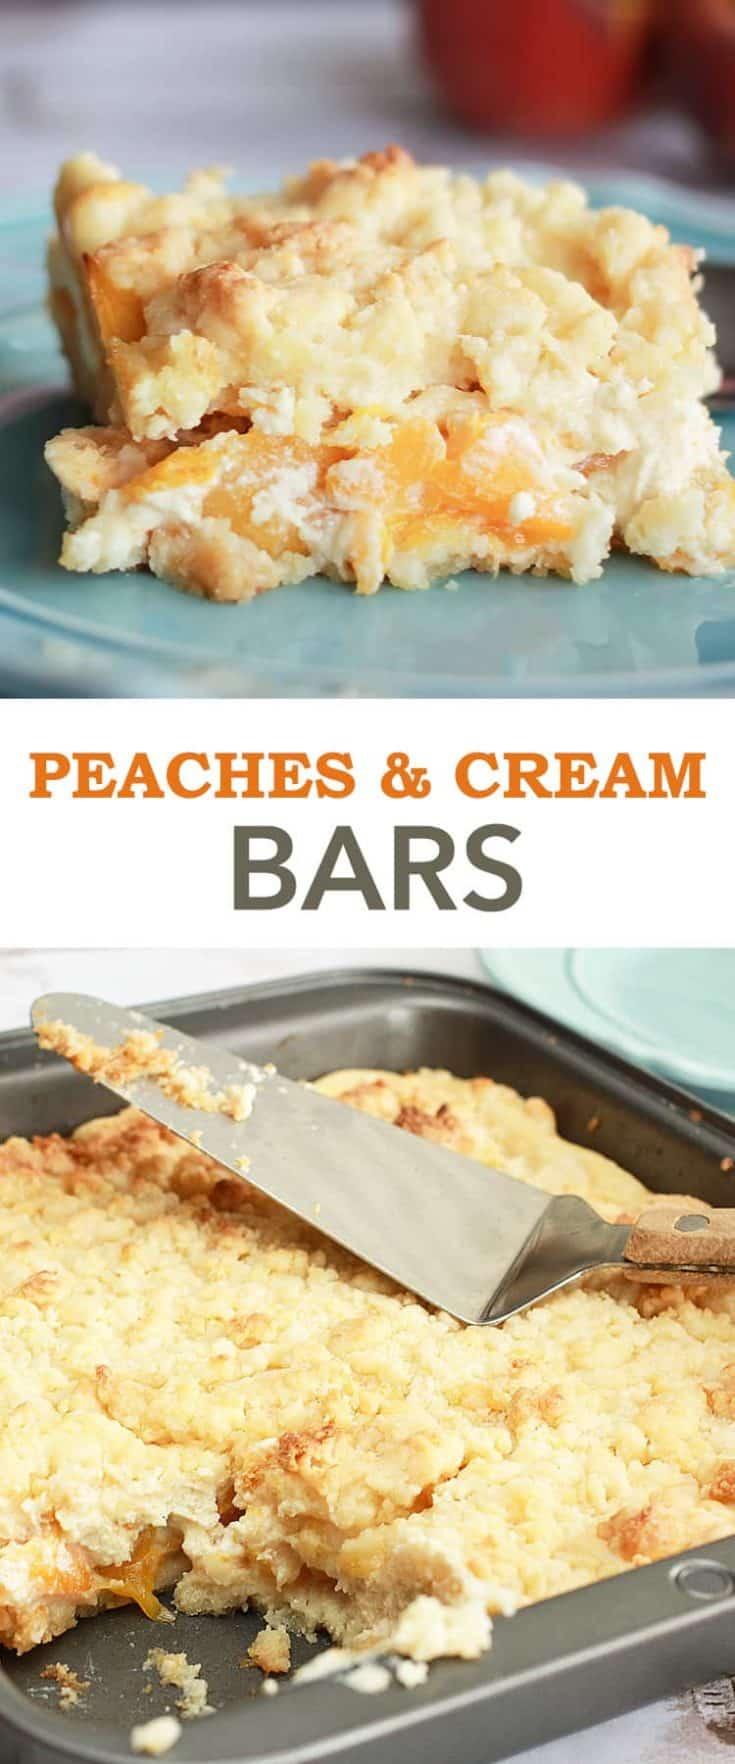 This Peaches and Cream Bars Recipe is a dessert made of fruit, white cake and cream cheese. Like a creamy peach cake, in bar form. #peachcake #peachbars #peachesandcream